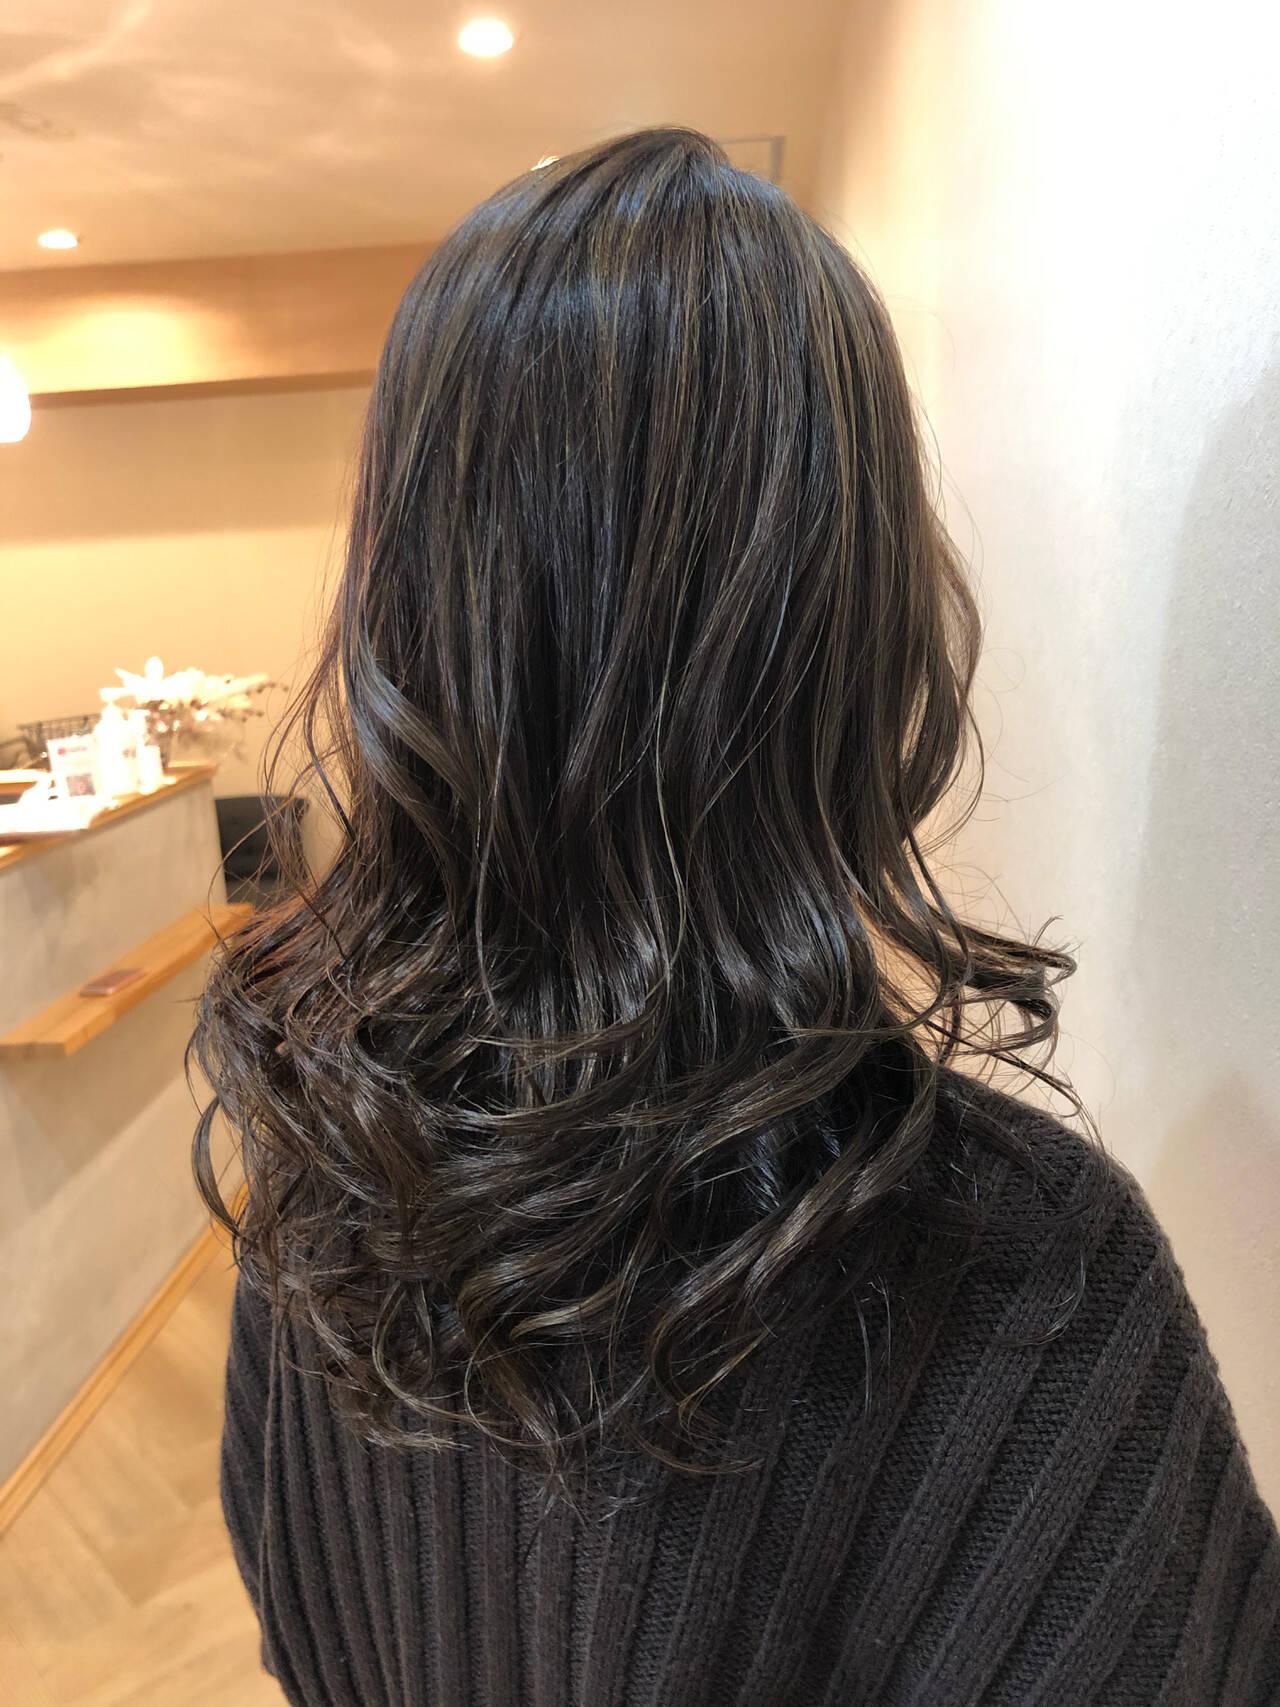 3Dハイライト アッシュグレージュ 大人ハイライト コンサバヘアスタイルや髪型の写真・画像